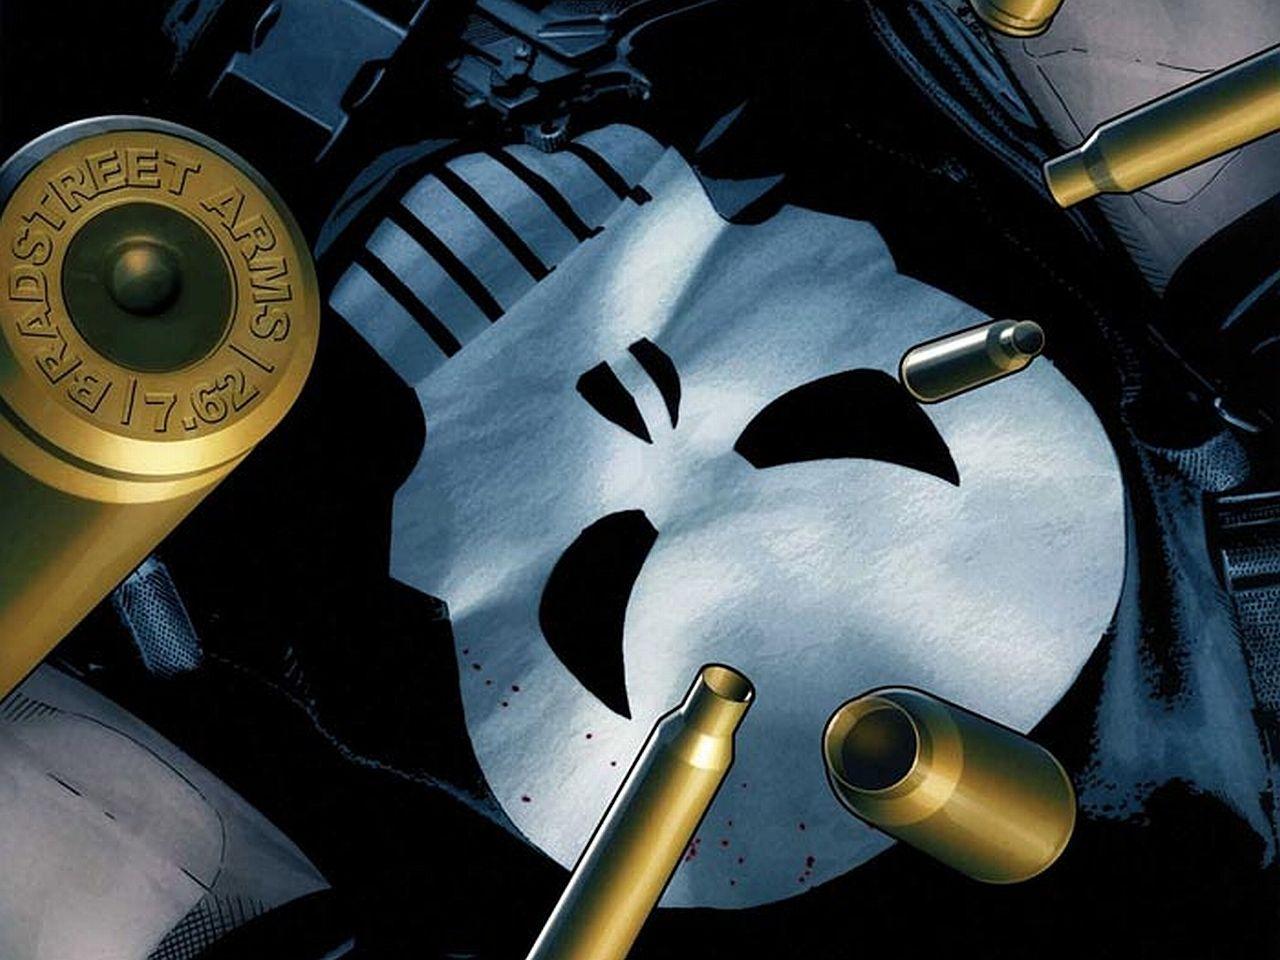 Comics punisher Wallpaper Wallpaper The Punisher